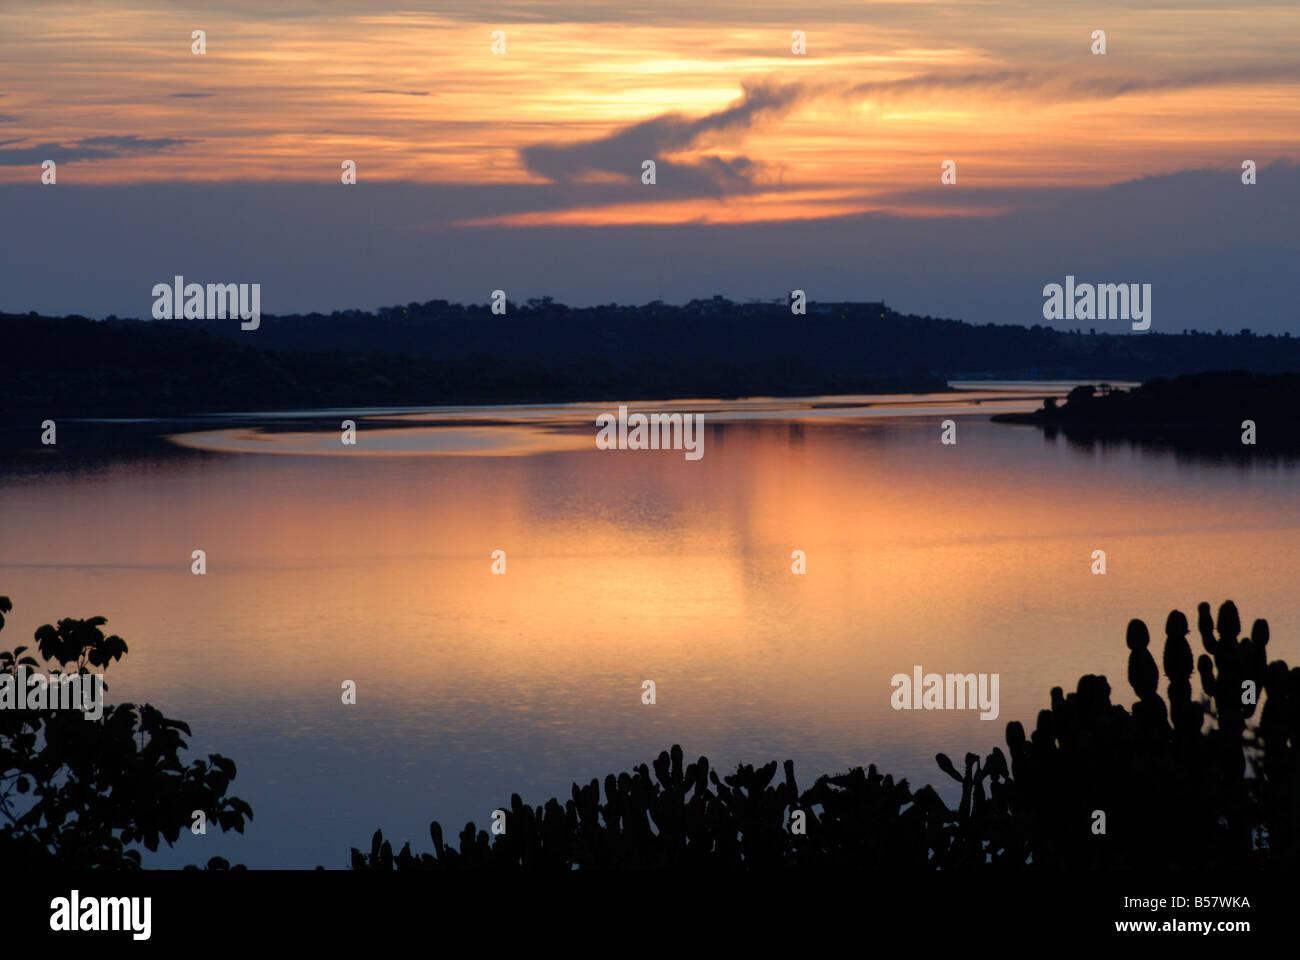 Queen Elizabeth National Park, Kazinga Channel, Uganda, East Africa, Africa - Stock Image